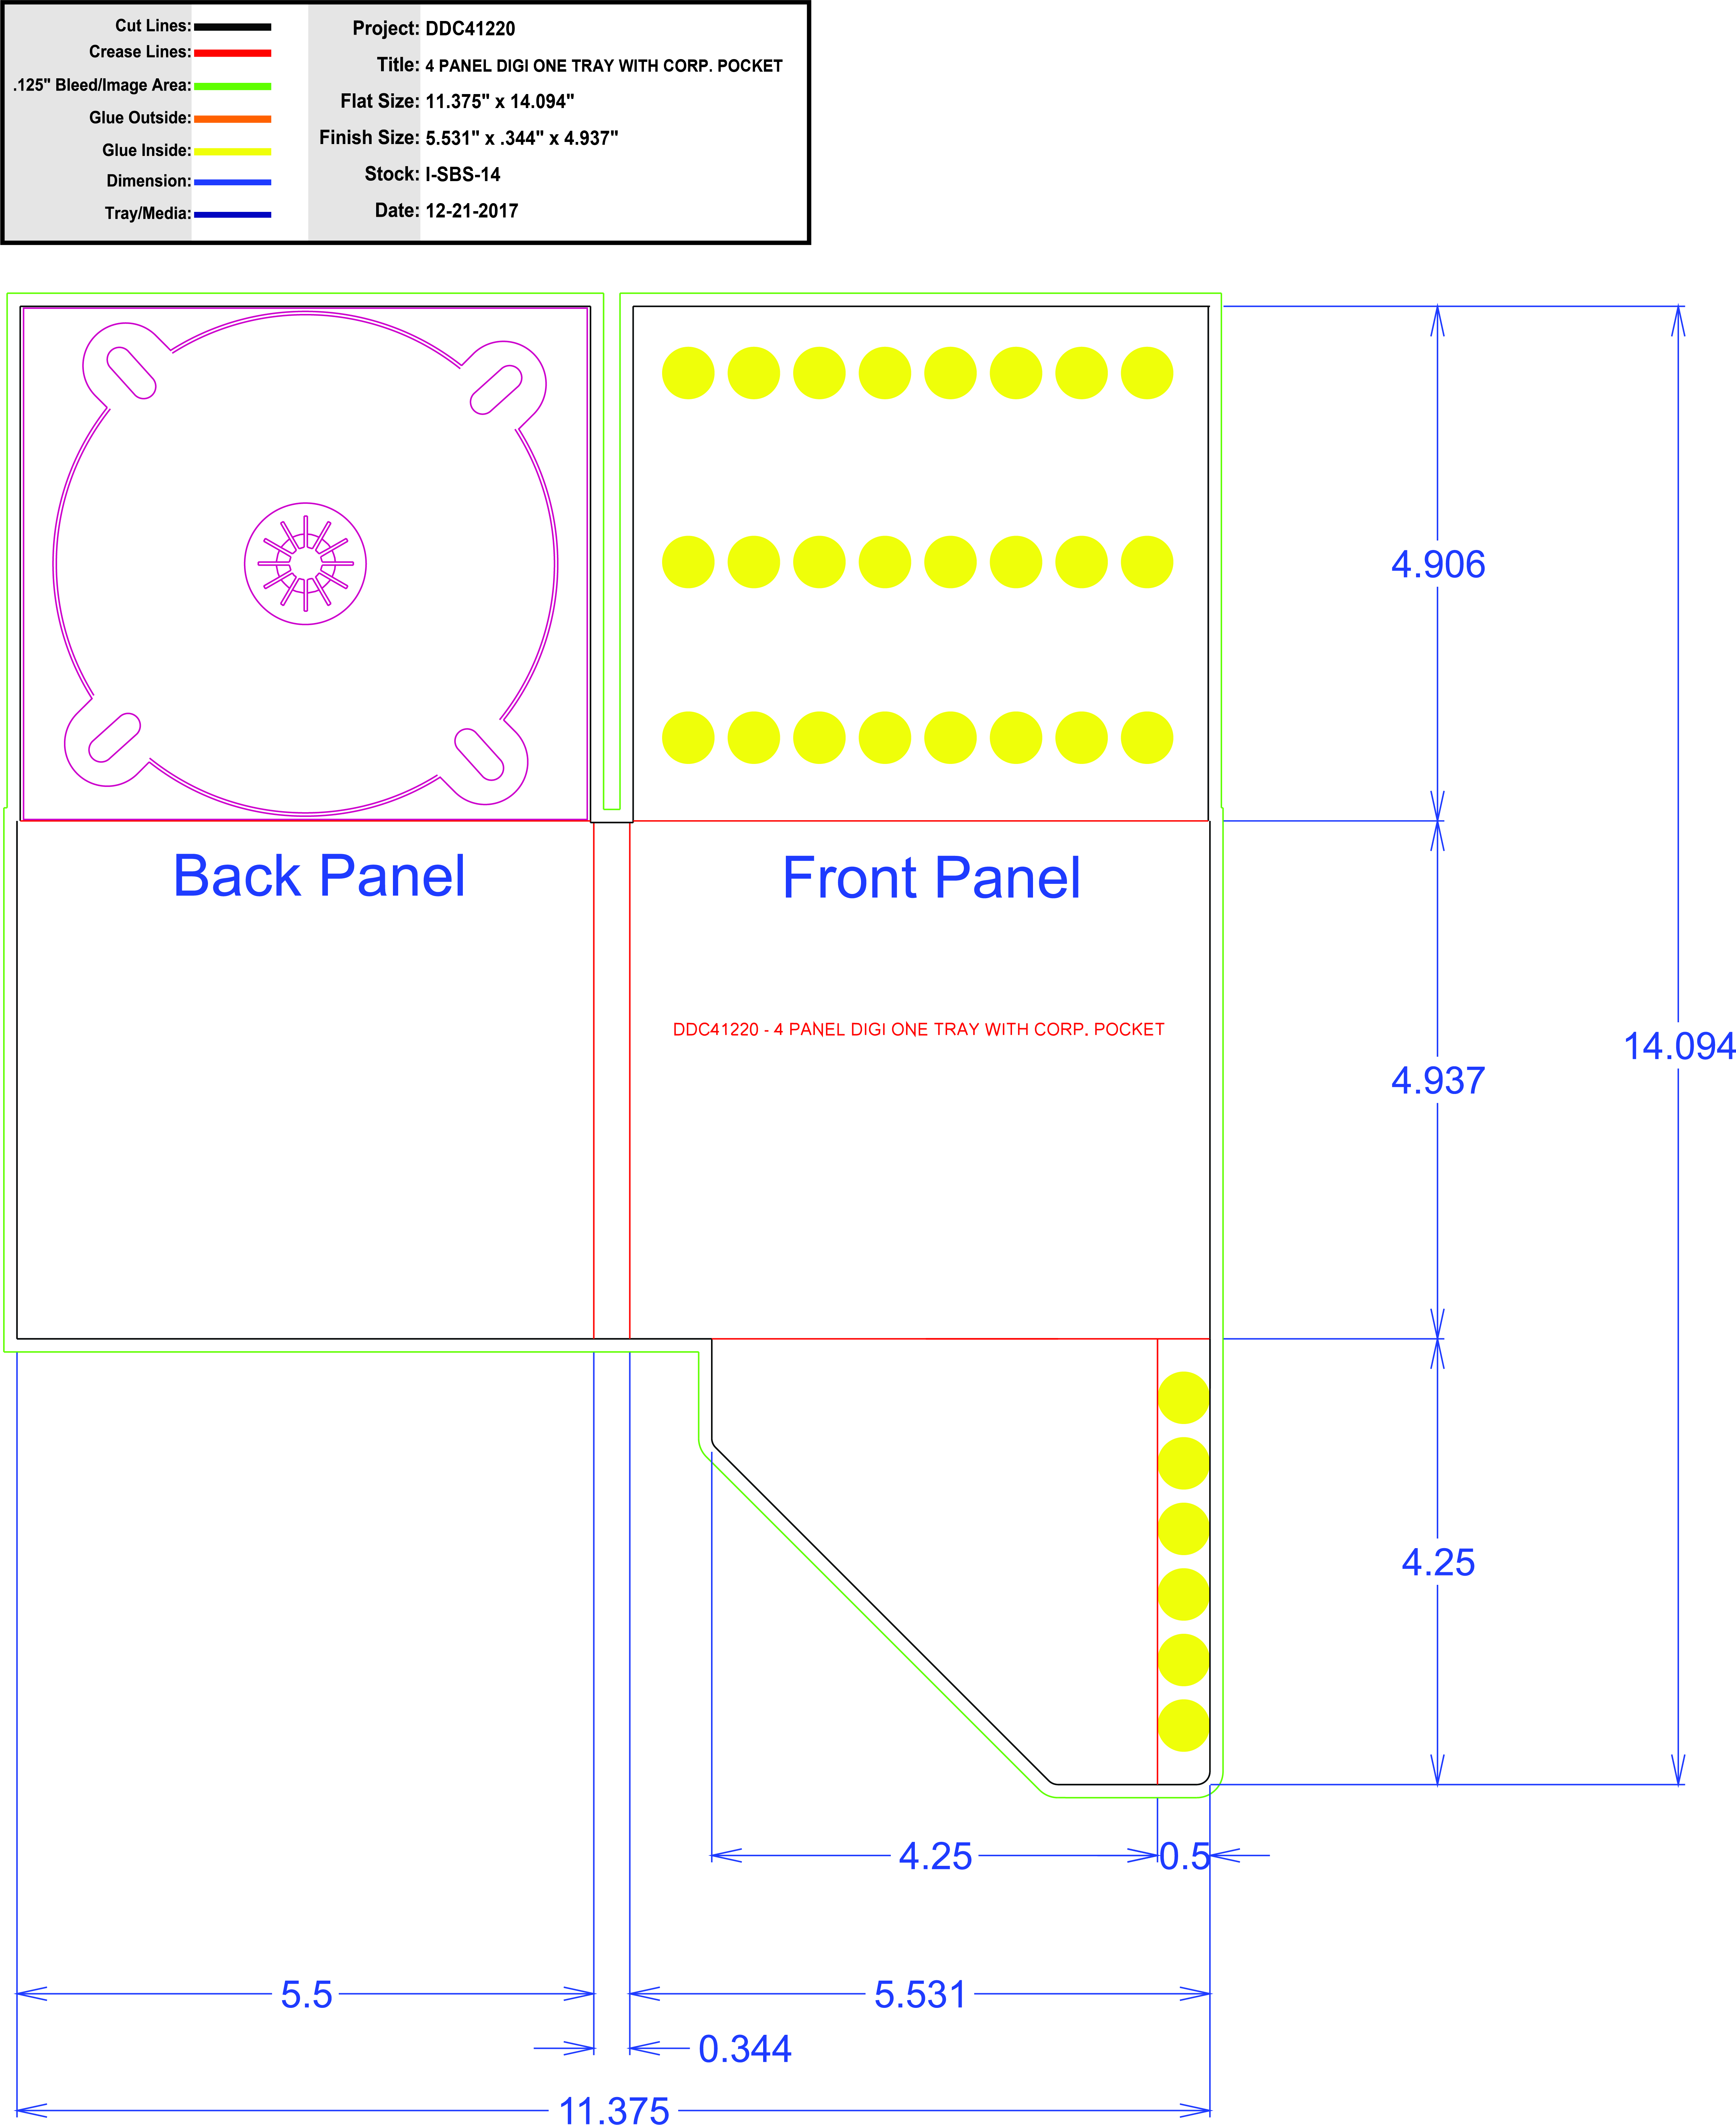 DDC41220 4 Panel Digi 1 Tray, Corp Pocket